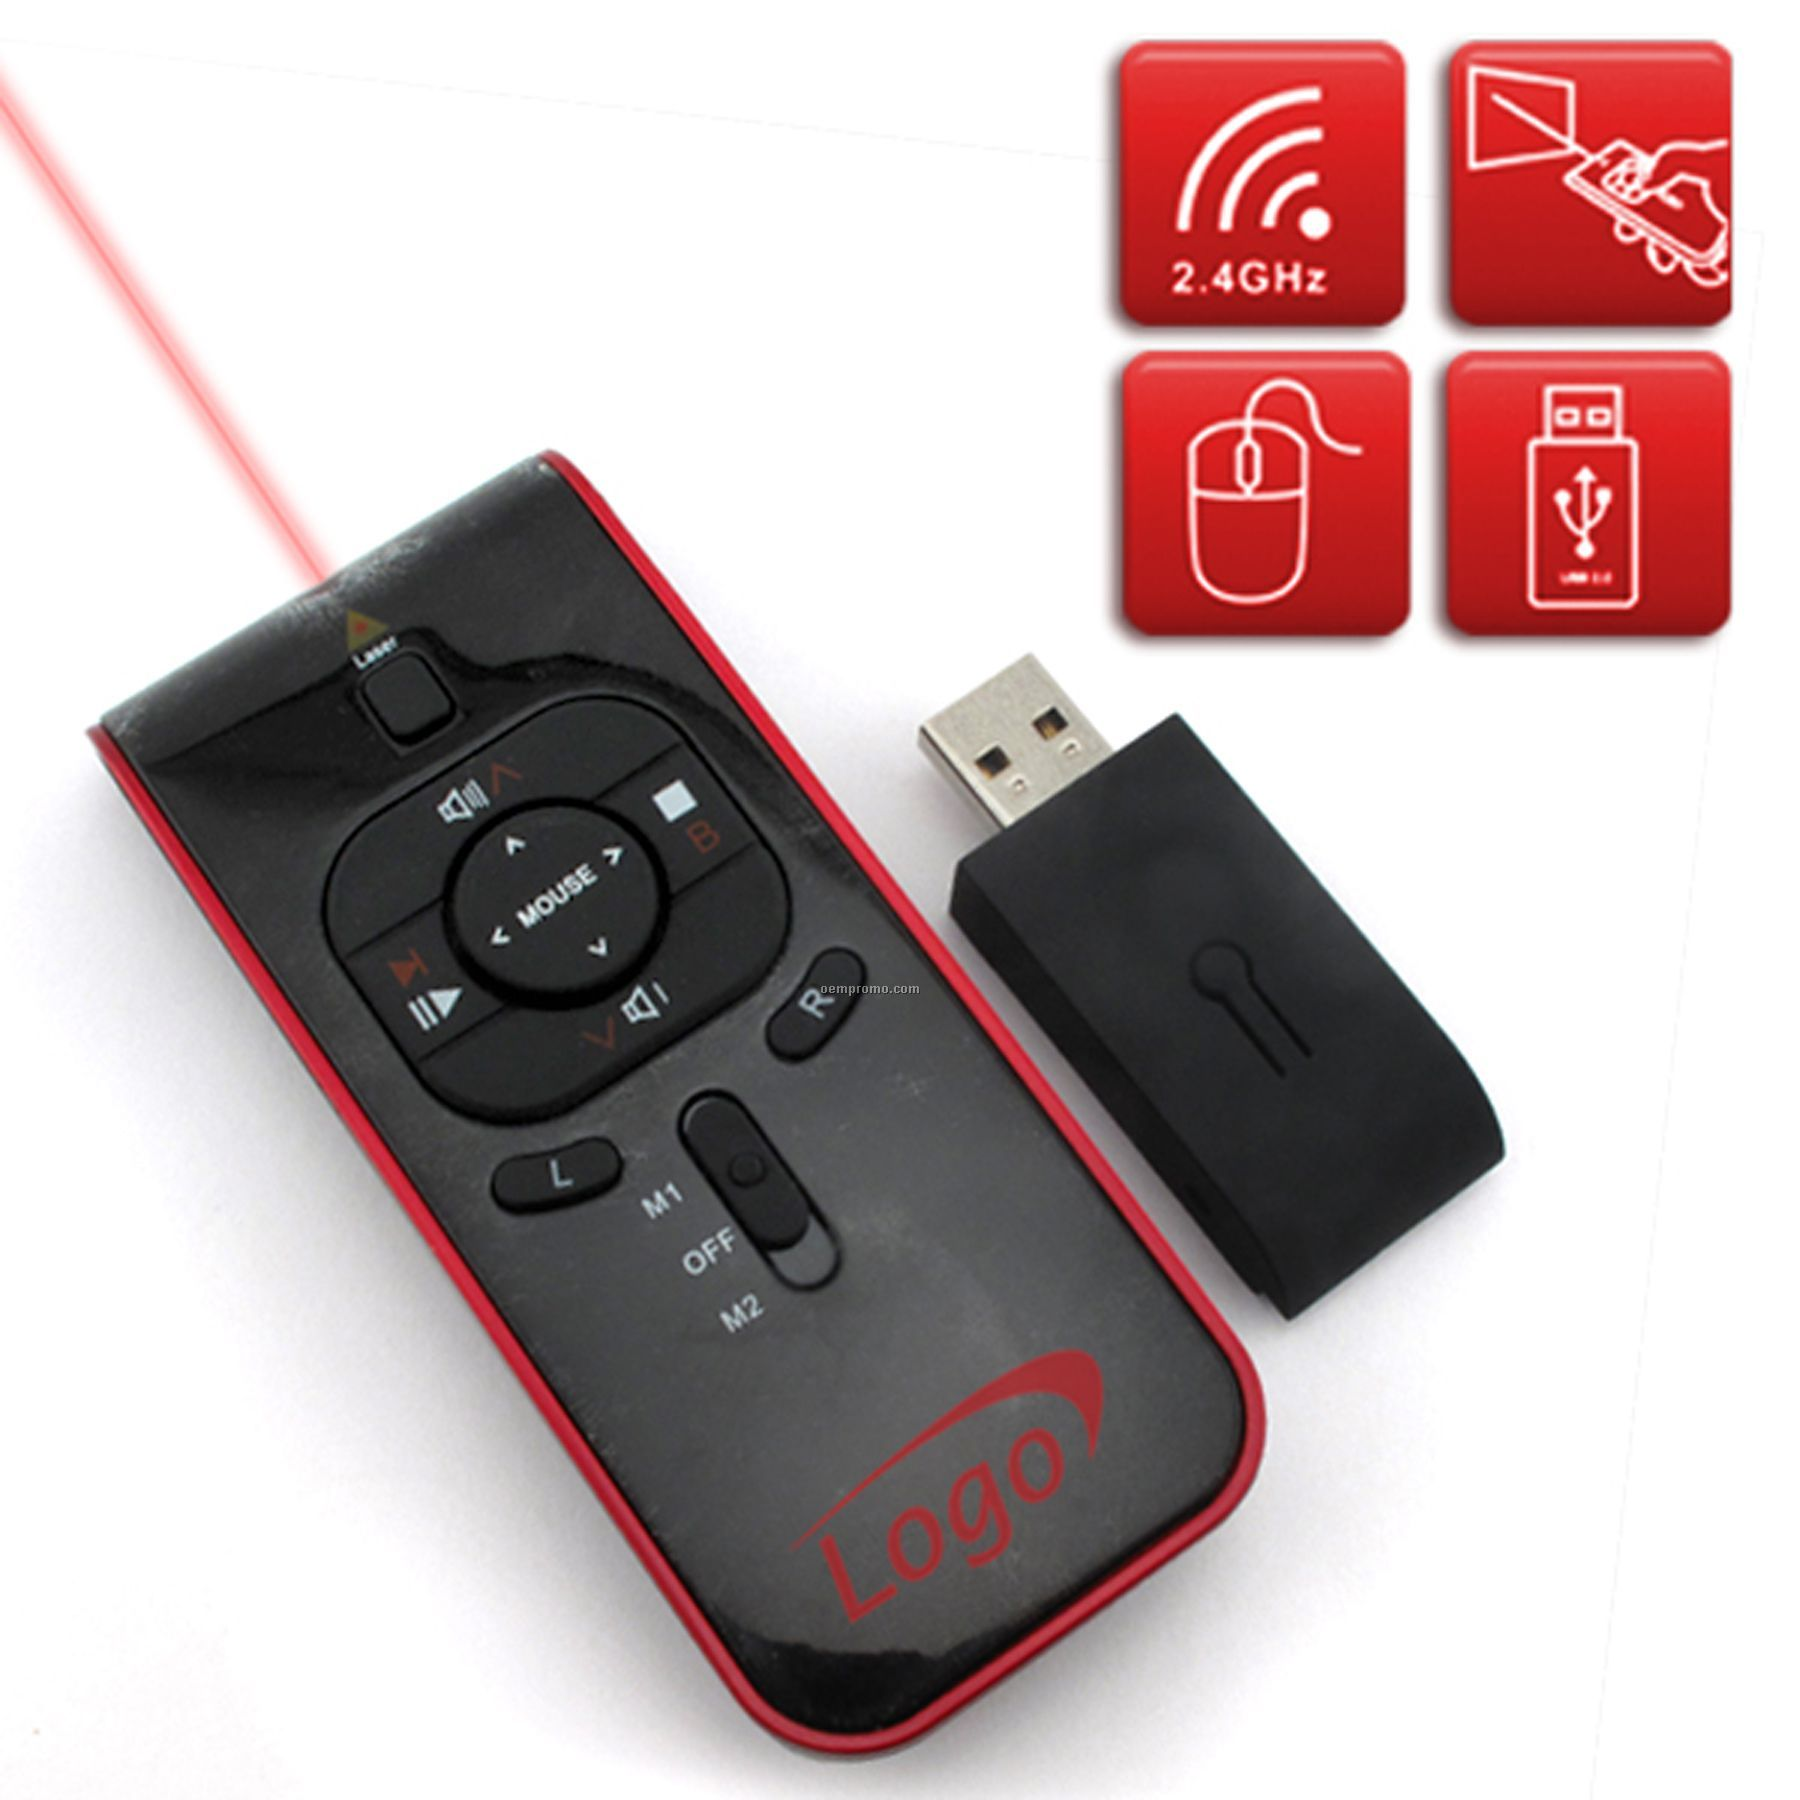 2 Gb Multimedia Wireless Presenter